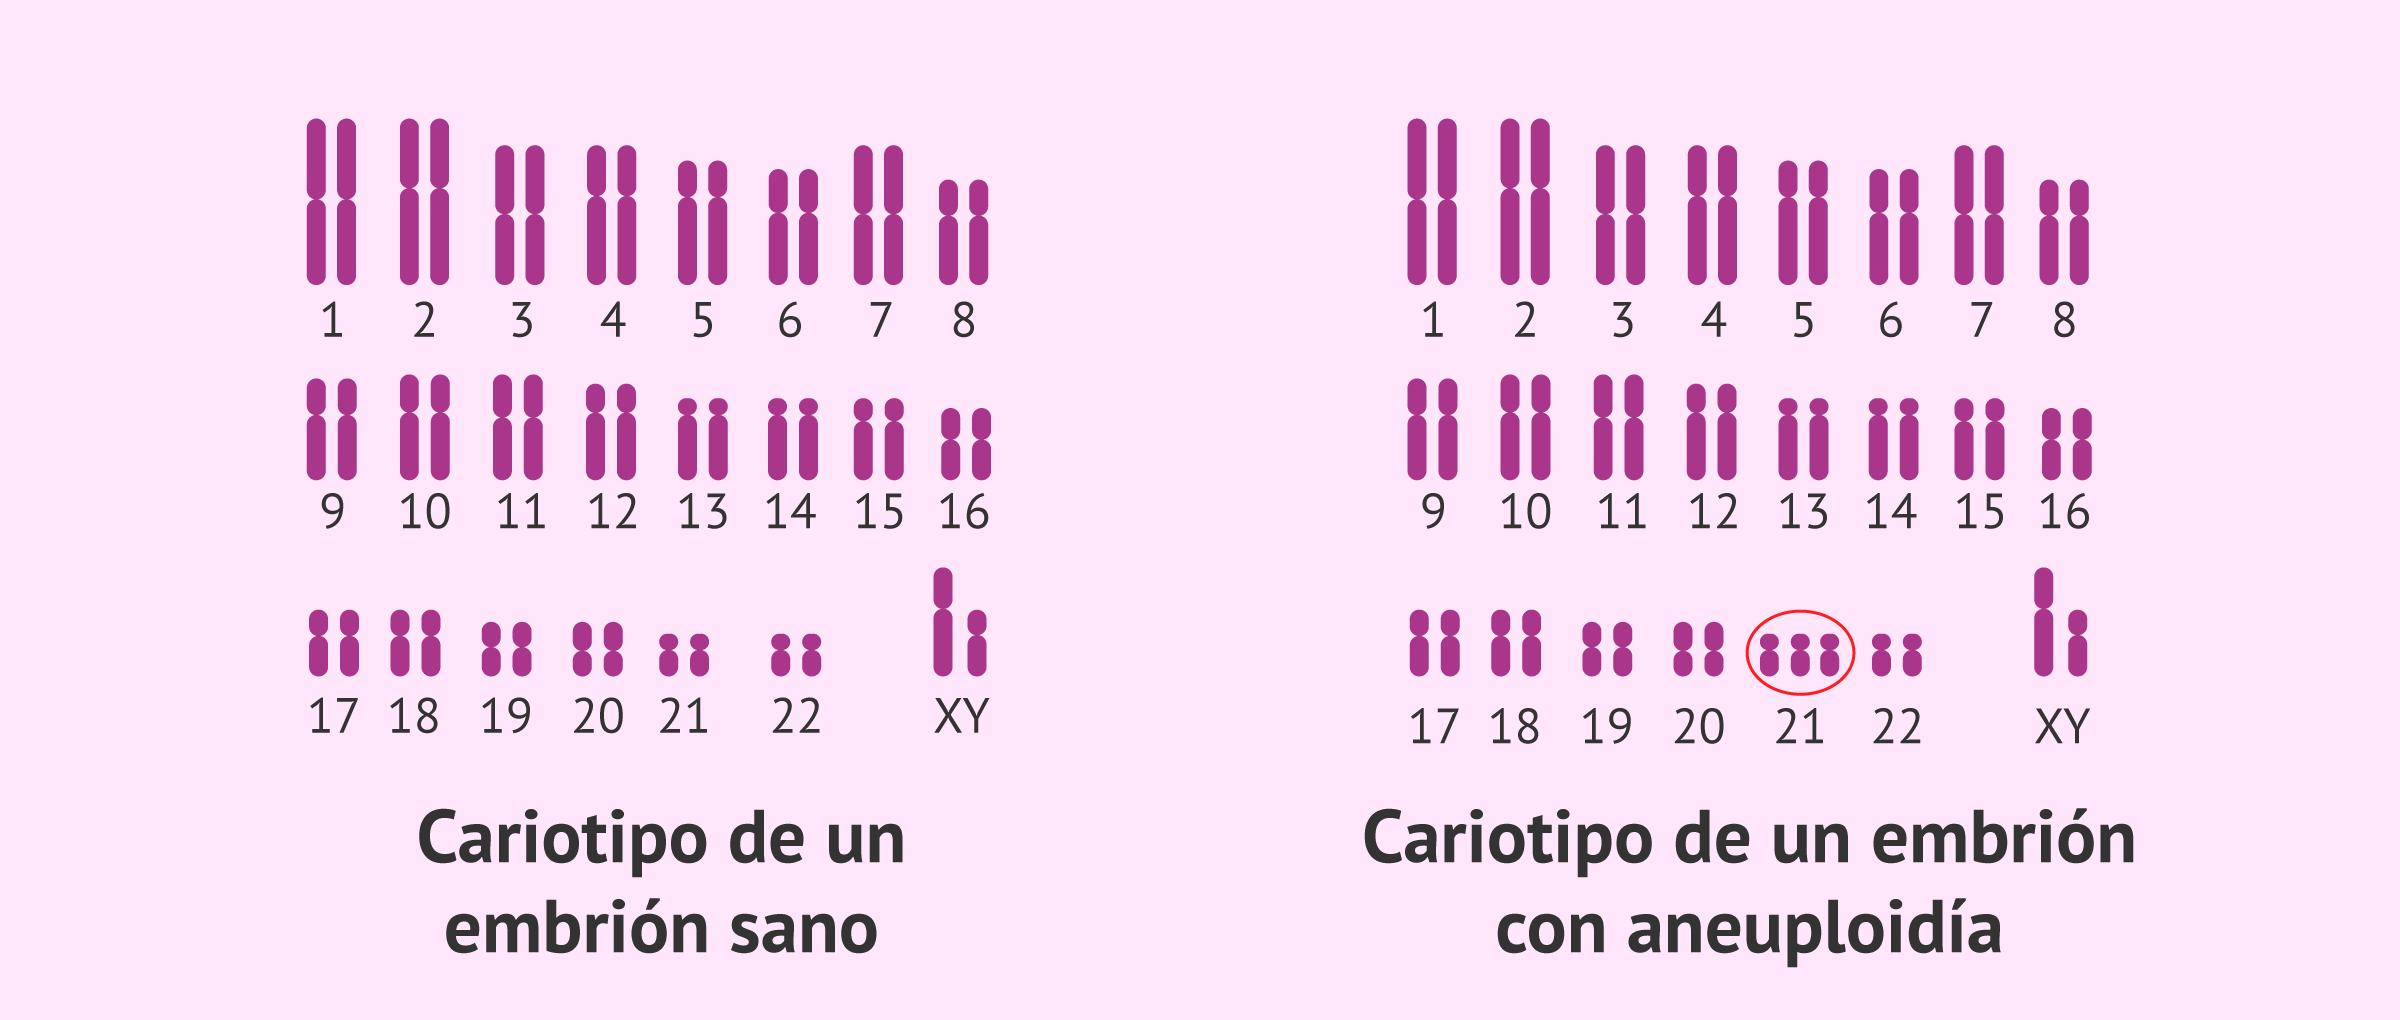 cariotipo-aneuploidia